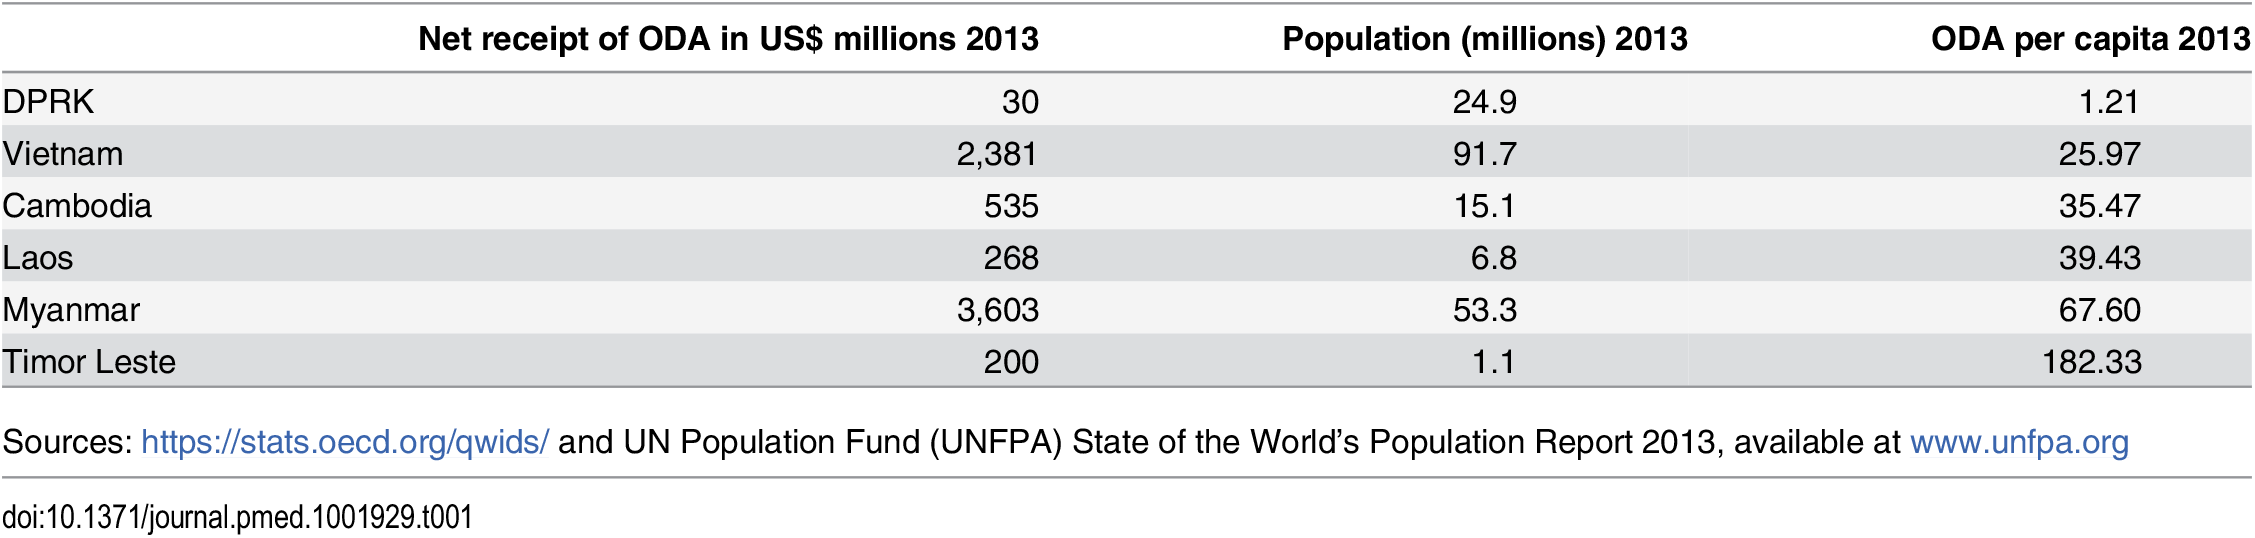 Net receipt of overseas development assistance (ODA) per capita in 2013 in selected nations.